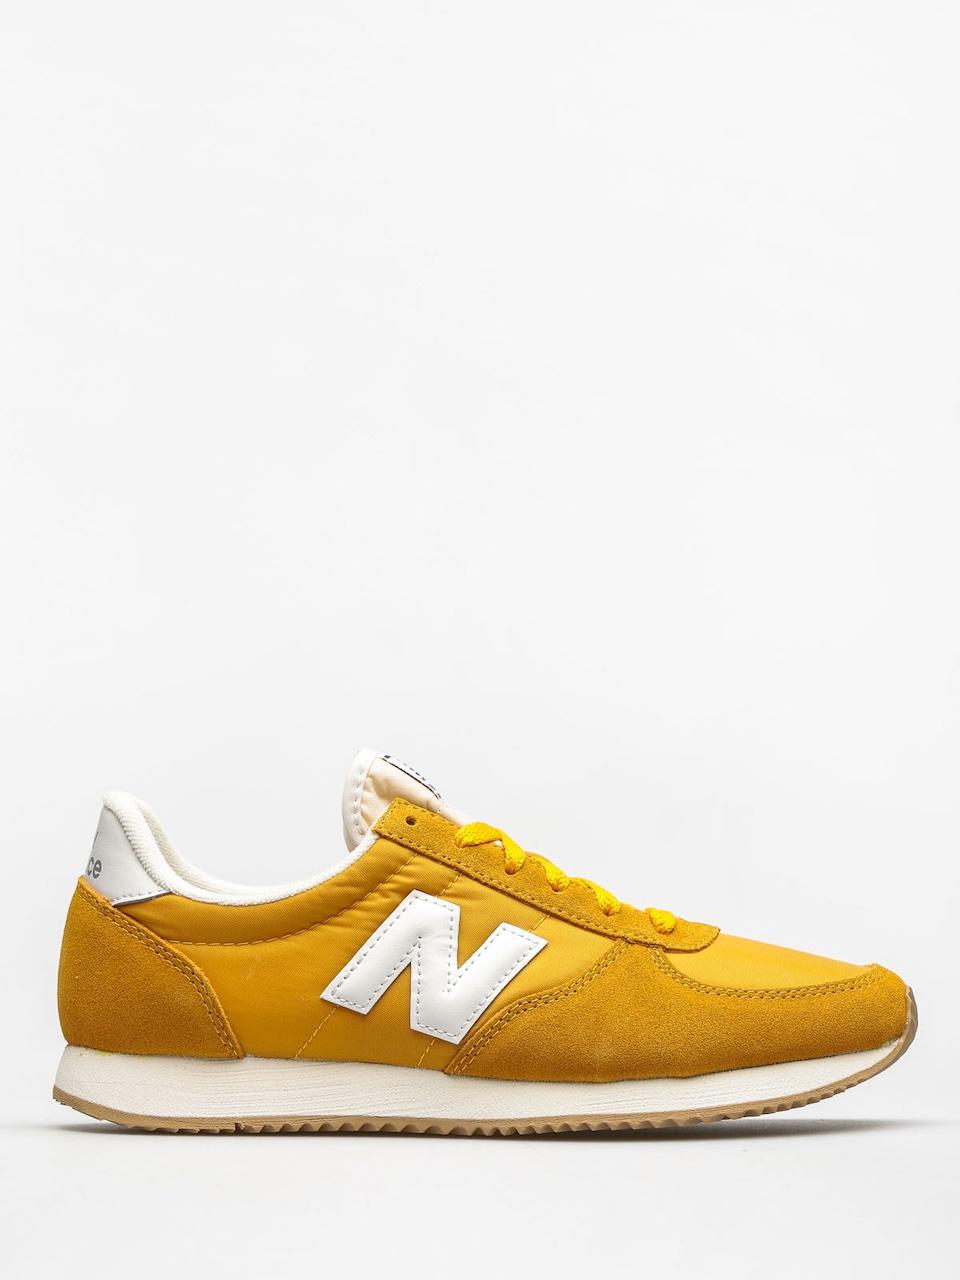 New Balance Shoes 220 (yellow)